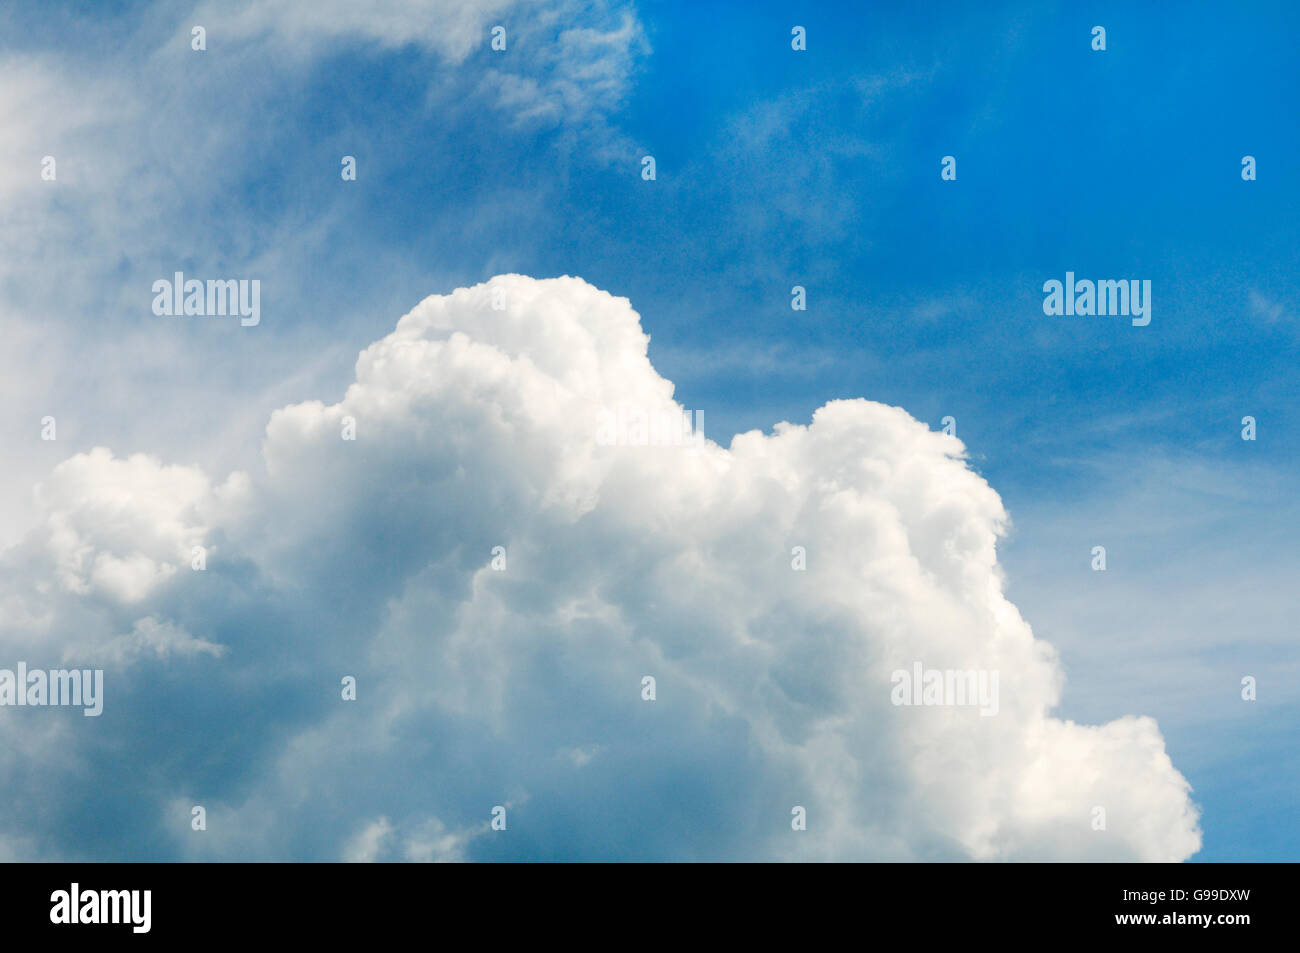 Puffy cumulus mélangé avec ciel bleu Photo Stock